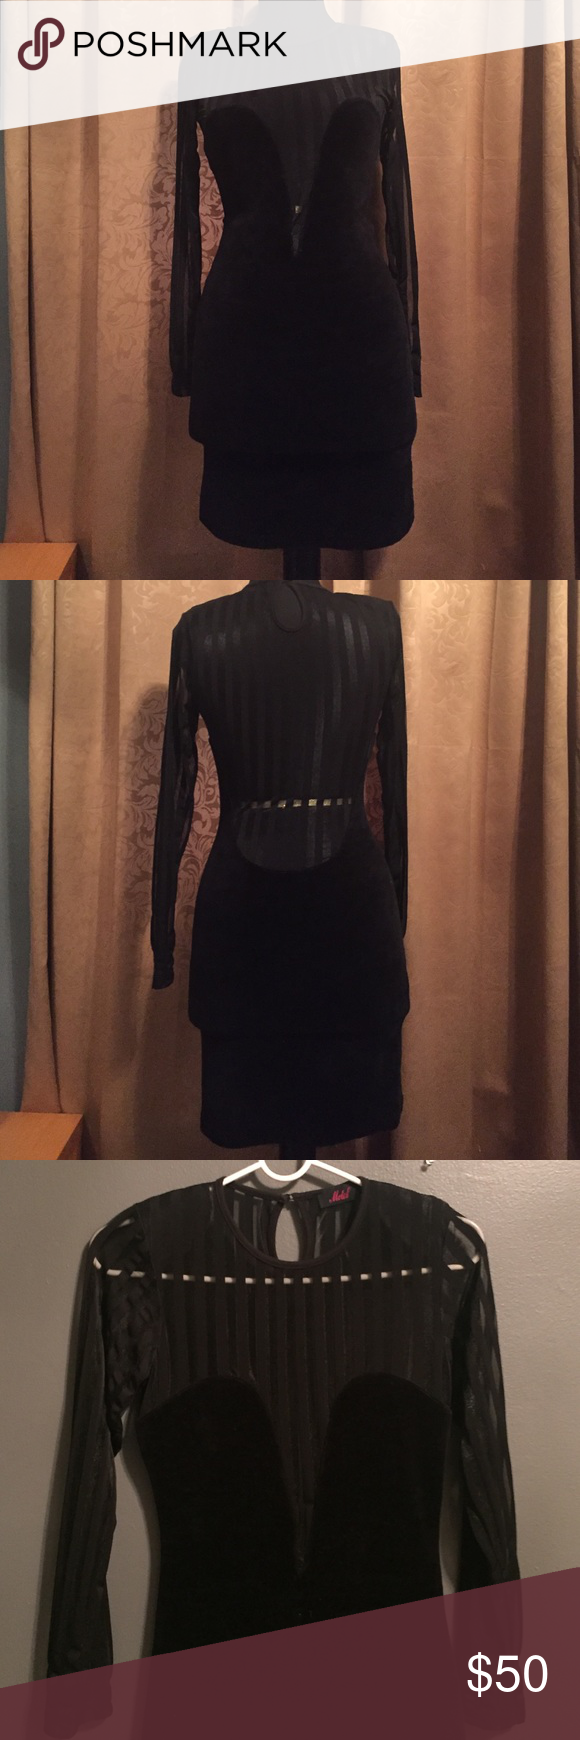 Long sleeve bodycon dress minis sleeve and dress black